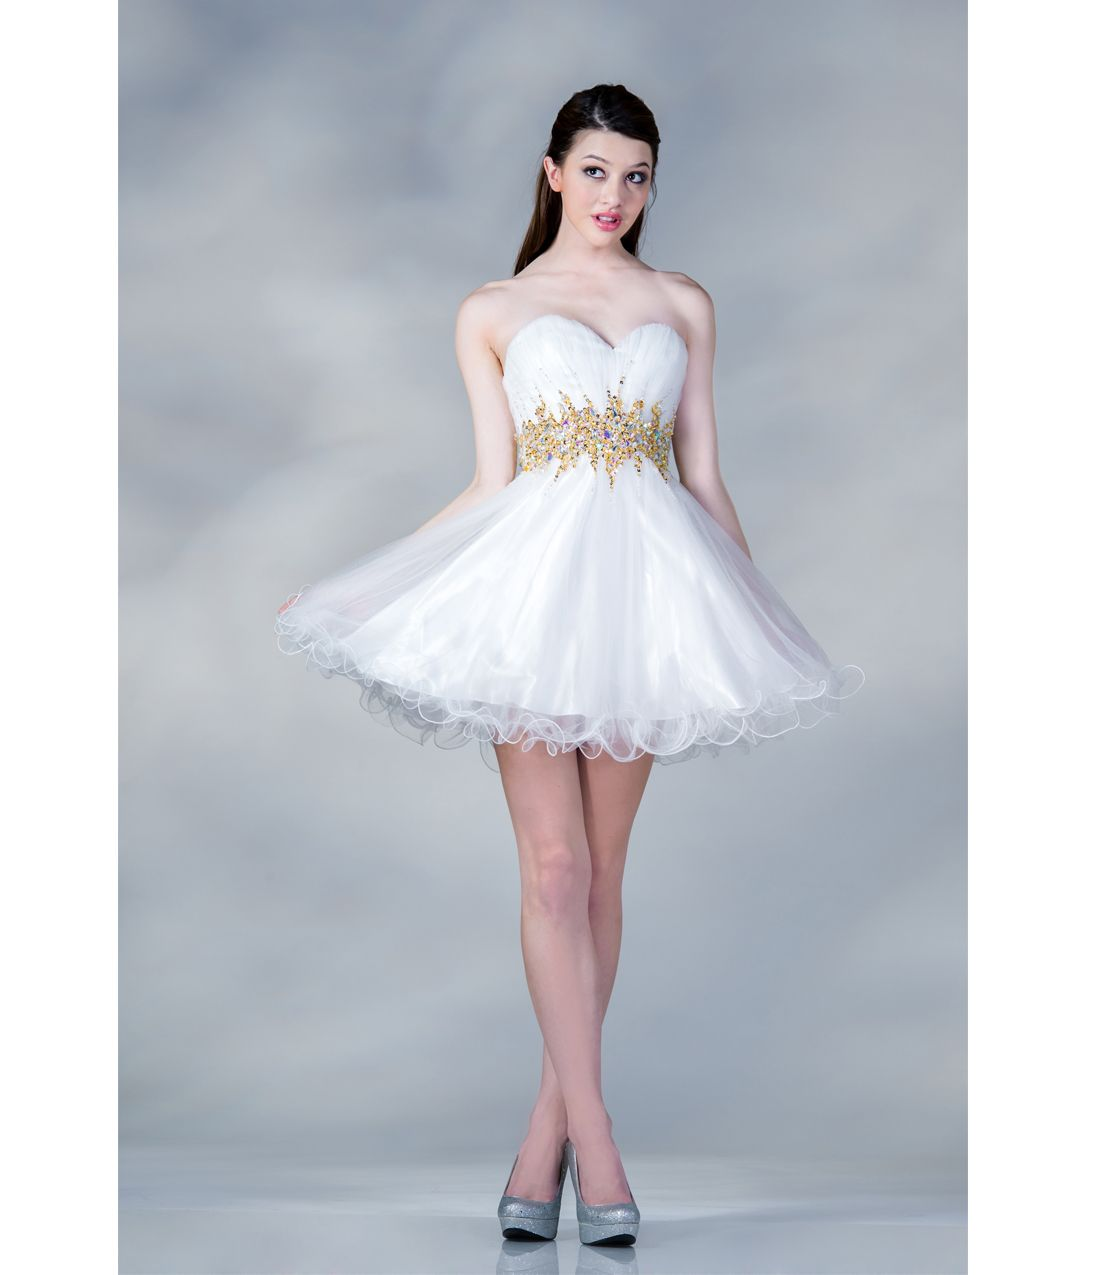 White & Gold Chiffon Sweetheart Short Prom Dress   Short Prom ...